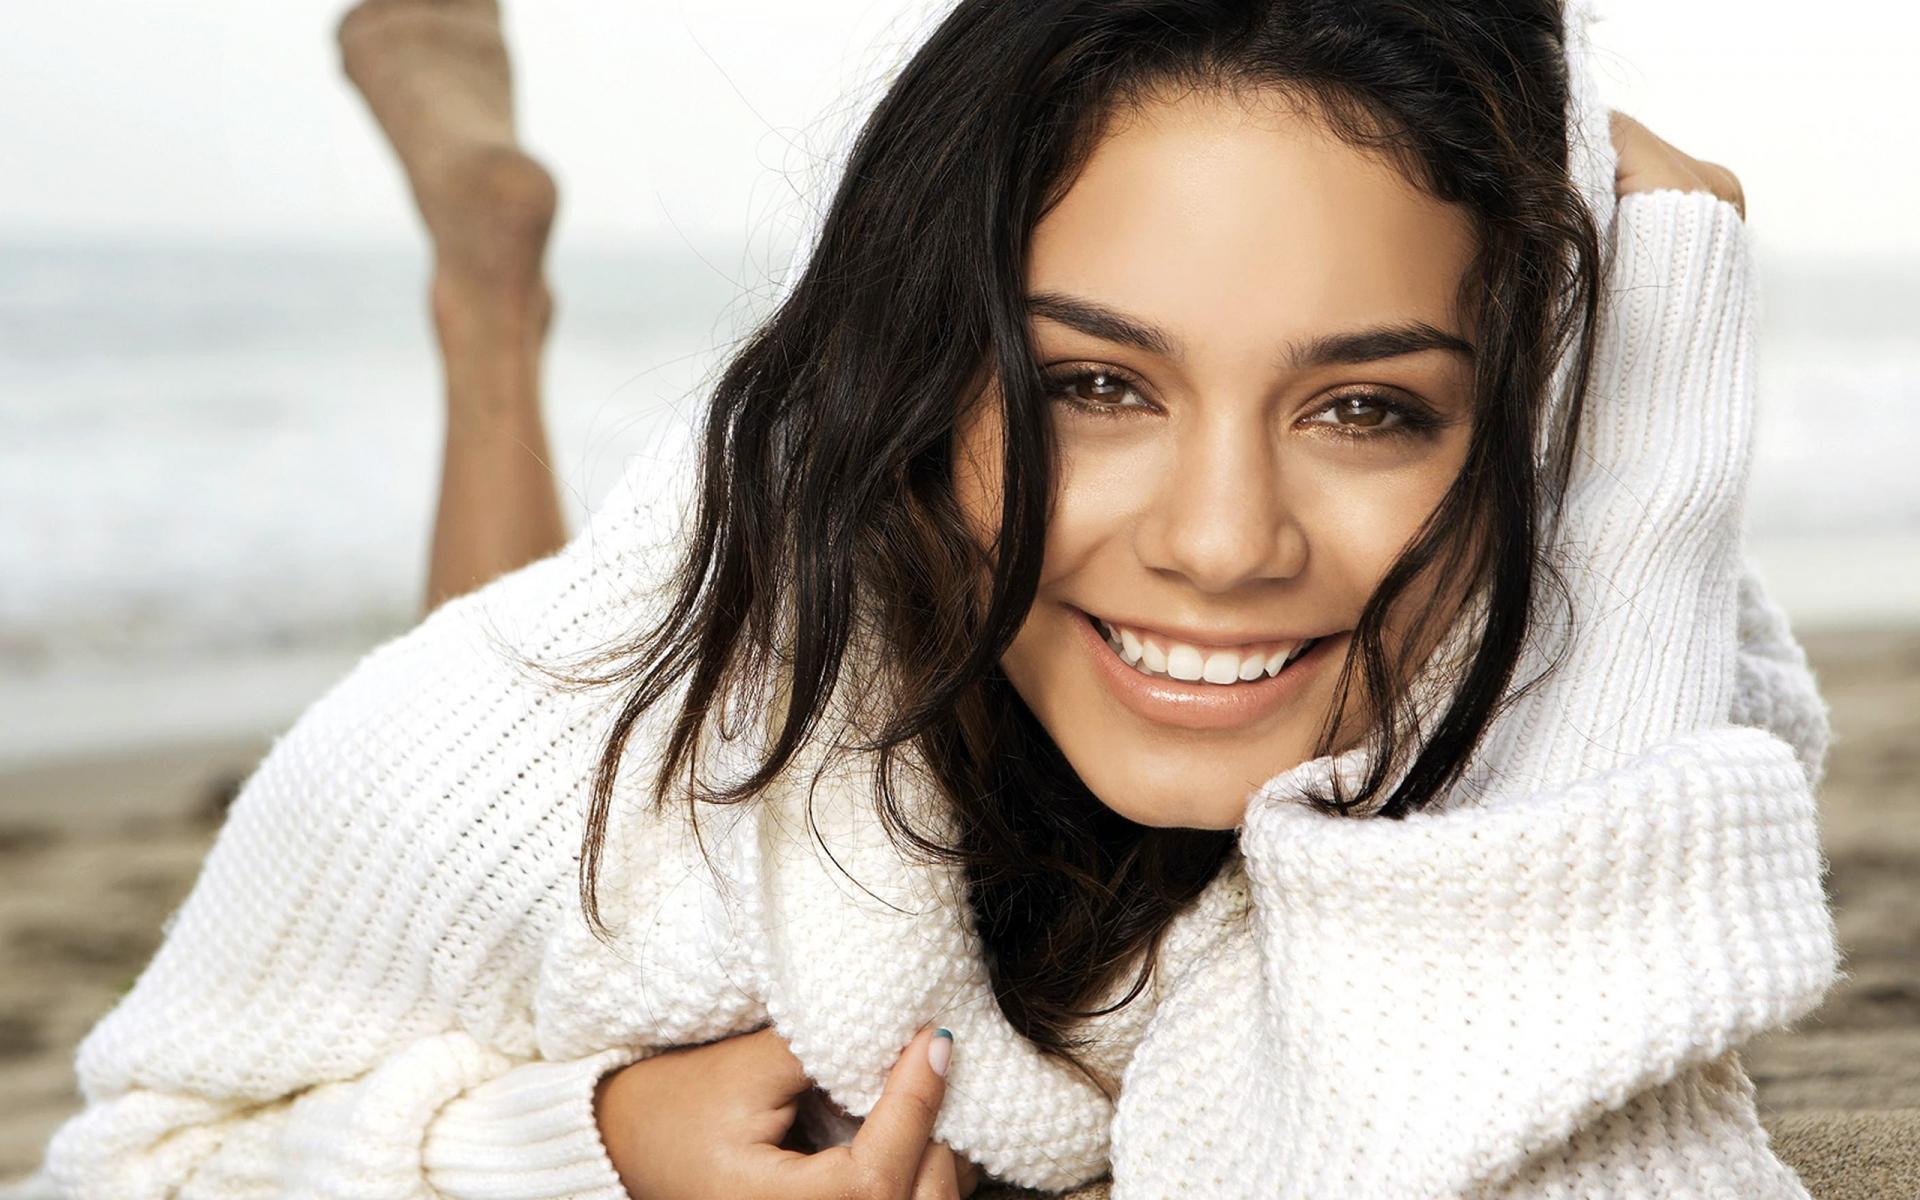 Vanessa Nicole Marano